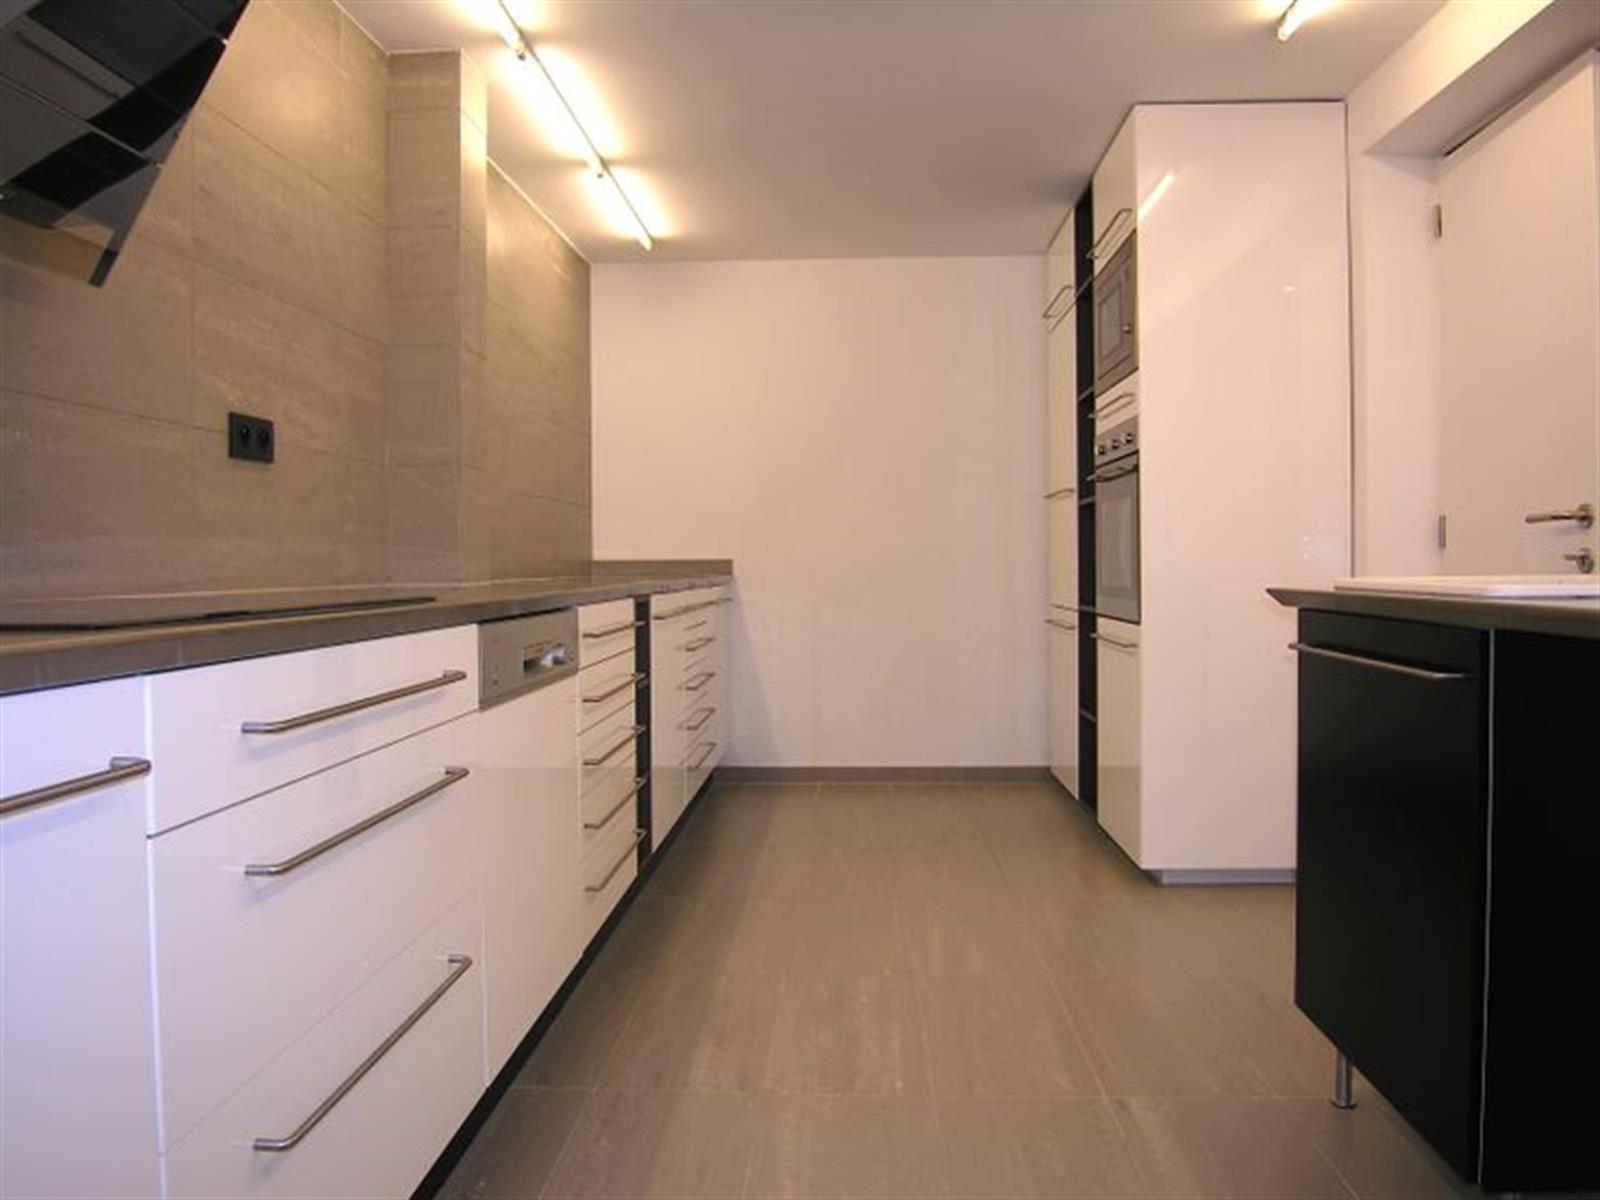 House - Etterbeek - #4448725-8